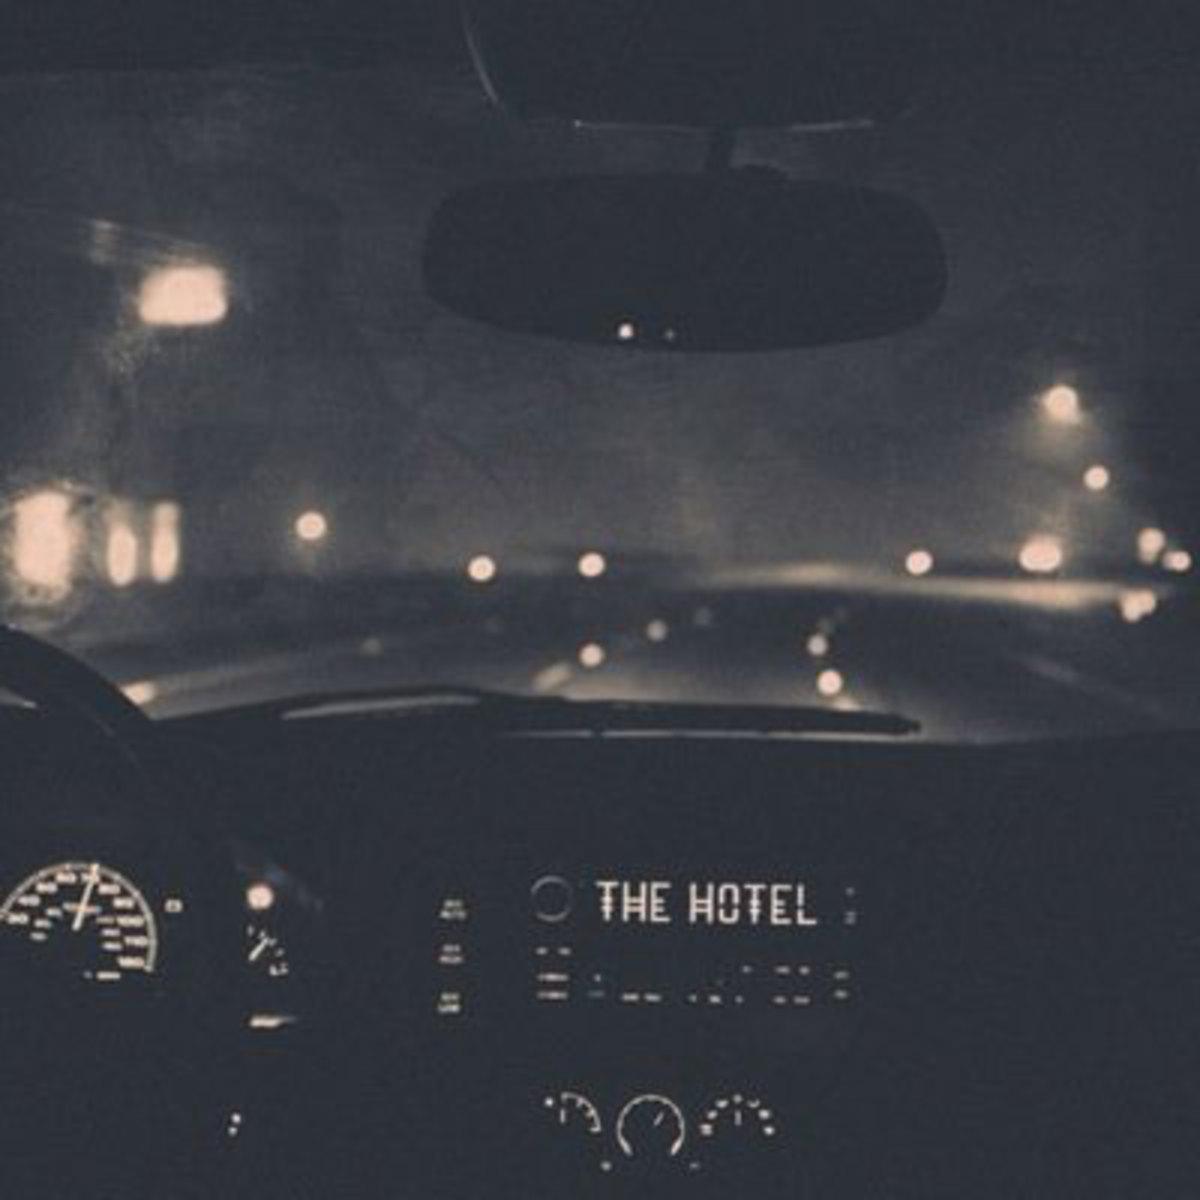 thehotel.jpg